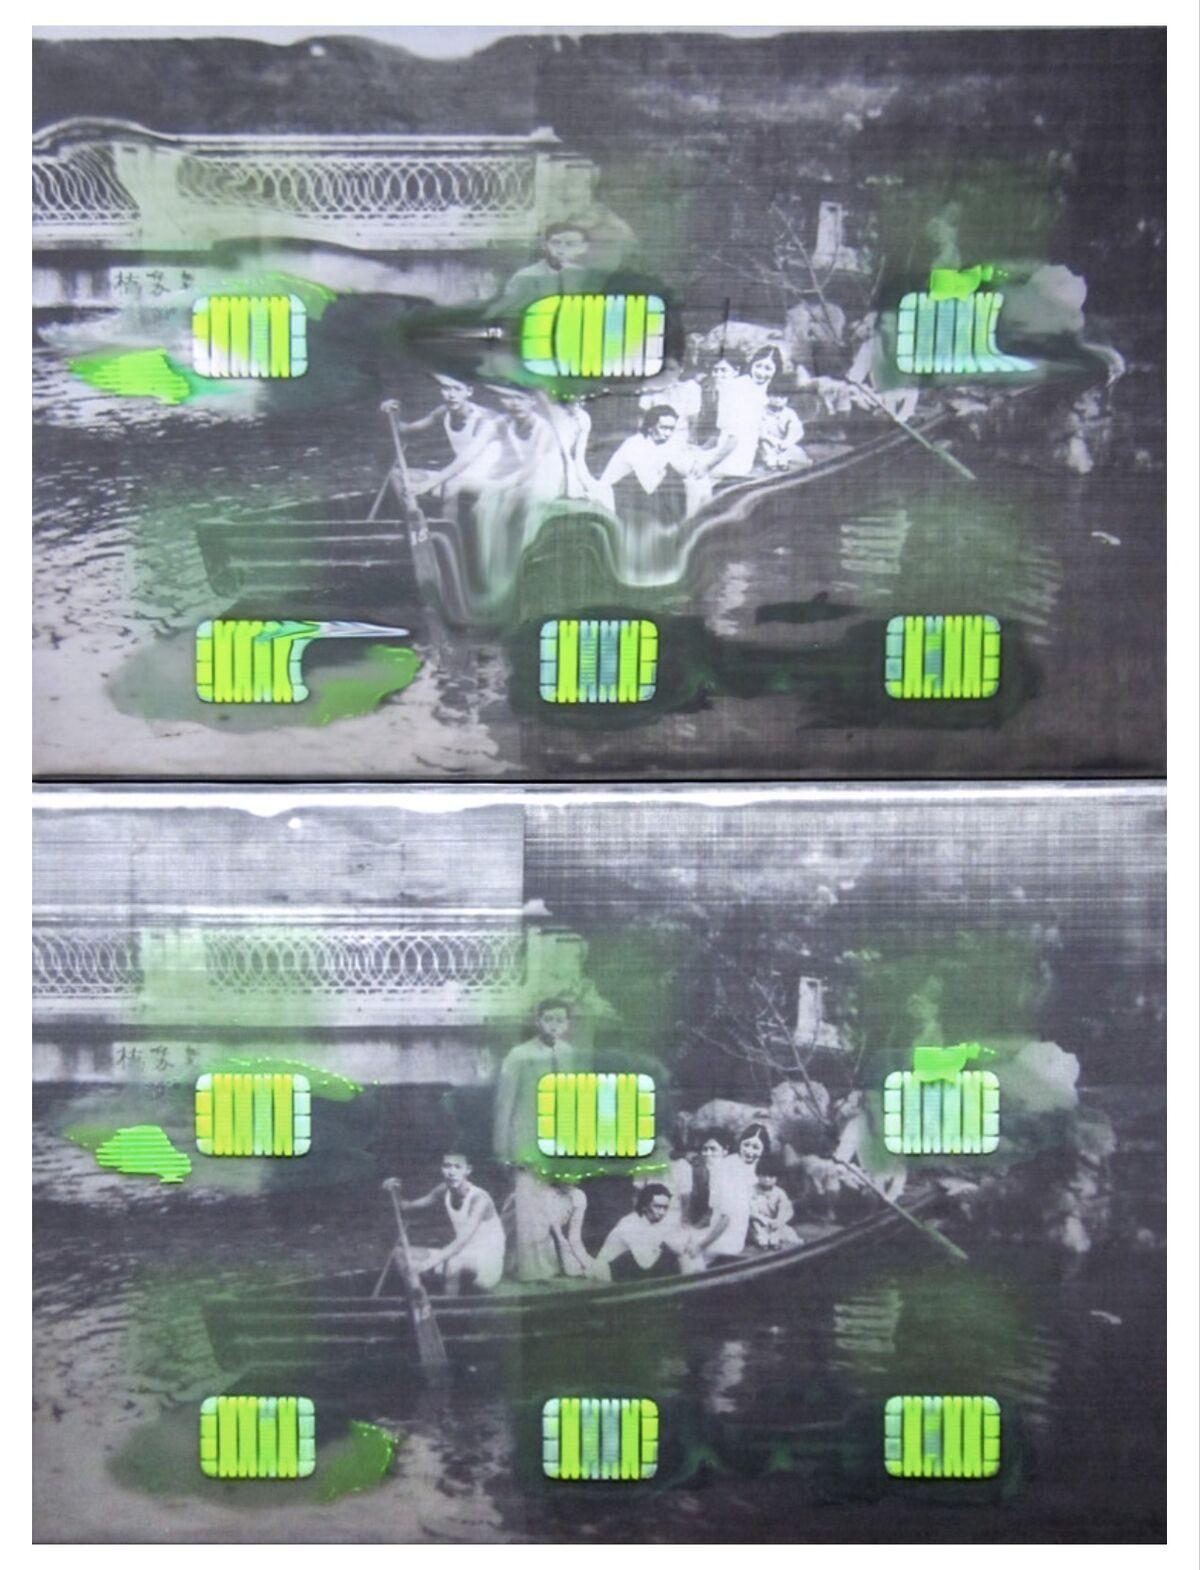 Tishan Hsu, Boating Scene (Diptych), 2016. Courtesy of Empty Gallery.